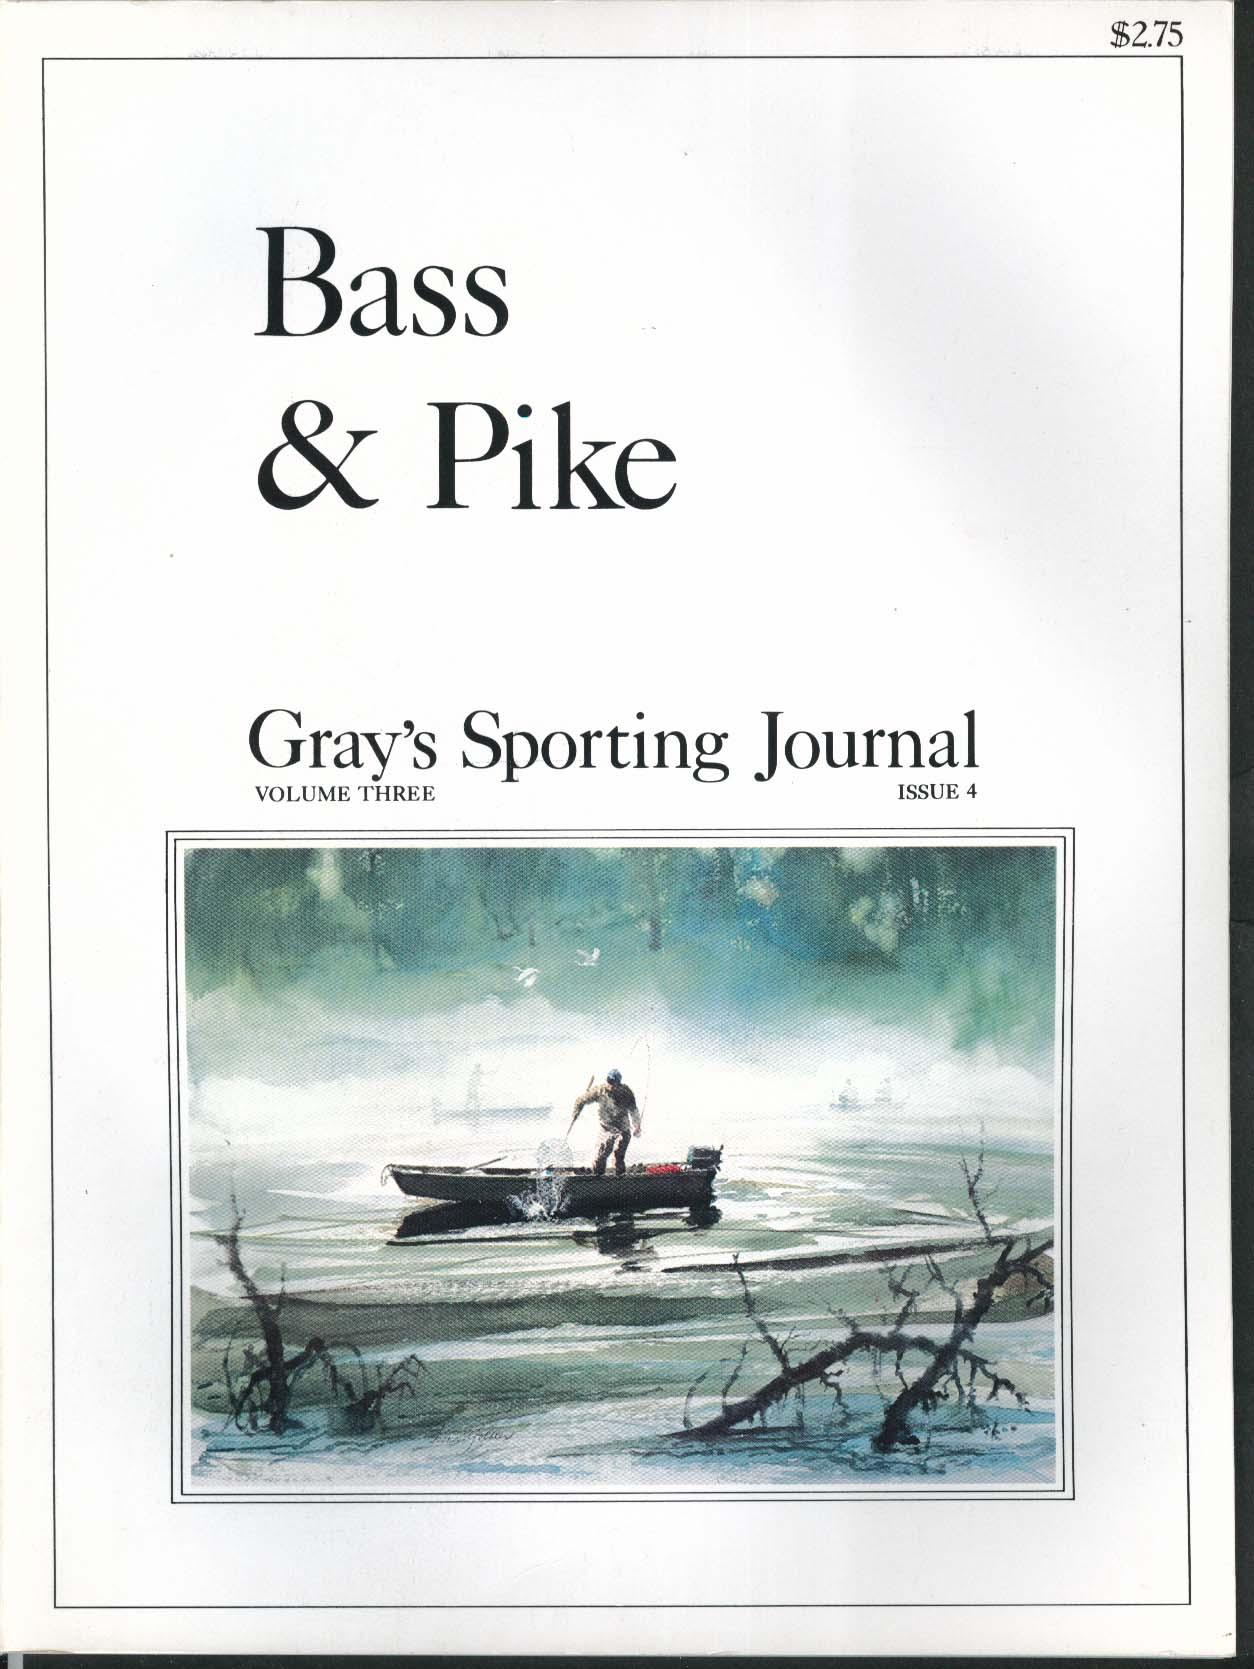 GRAY'S SPORTING JOURNAL Vol 3 #4 Bass & Pike Currituck St Johns 7 1978